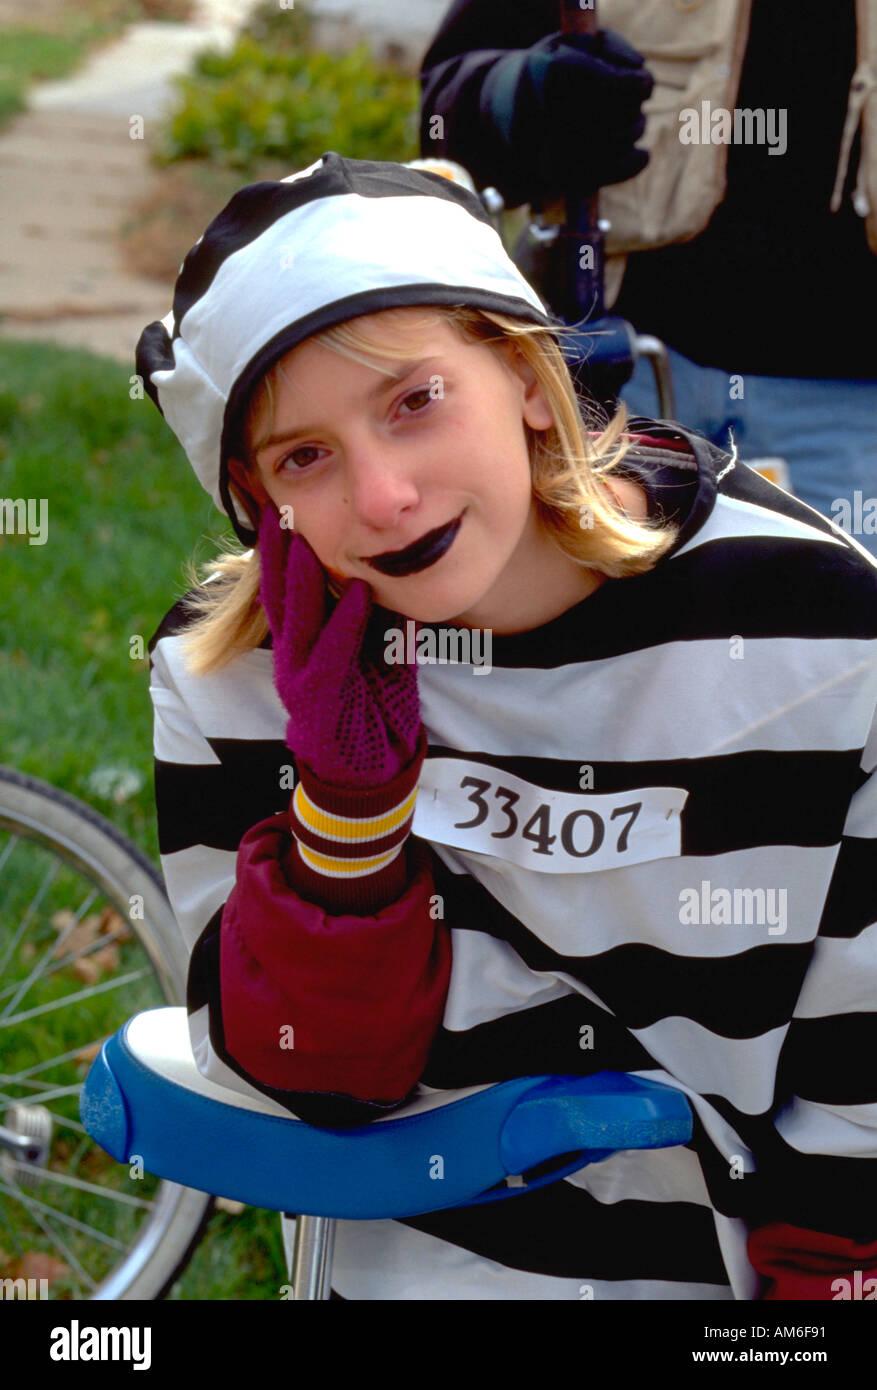 Anoka Halloween Parade 2020 Footage Girl age 14 in prisoner costume at Anoka Halloween Festival Parade